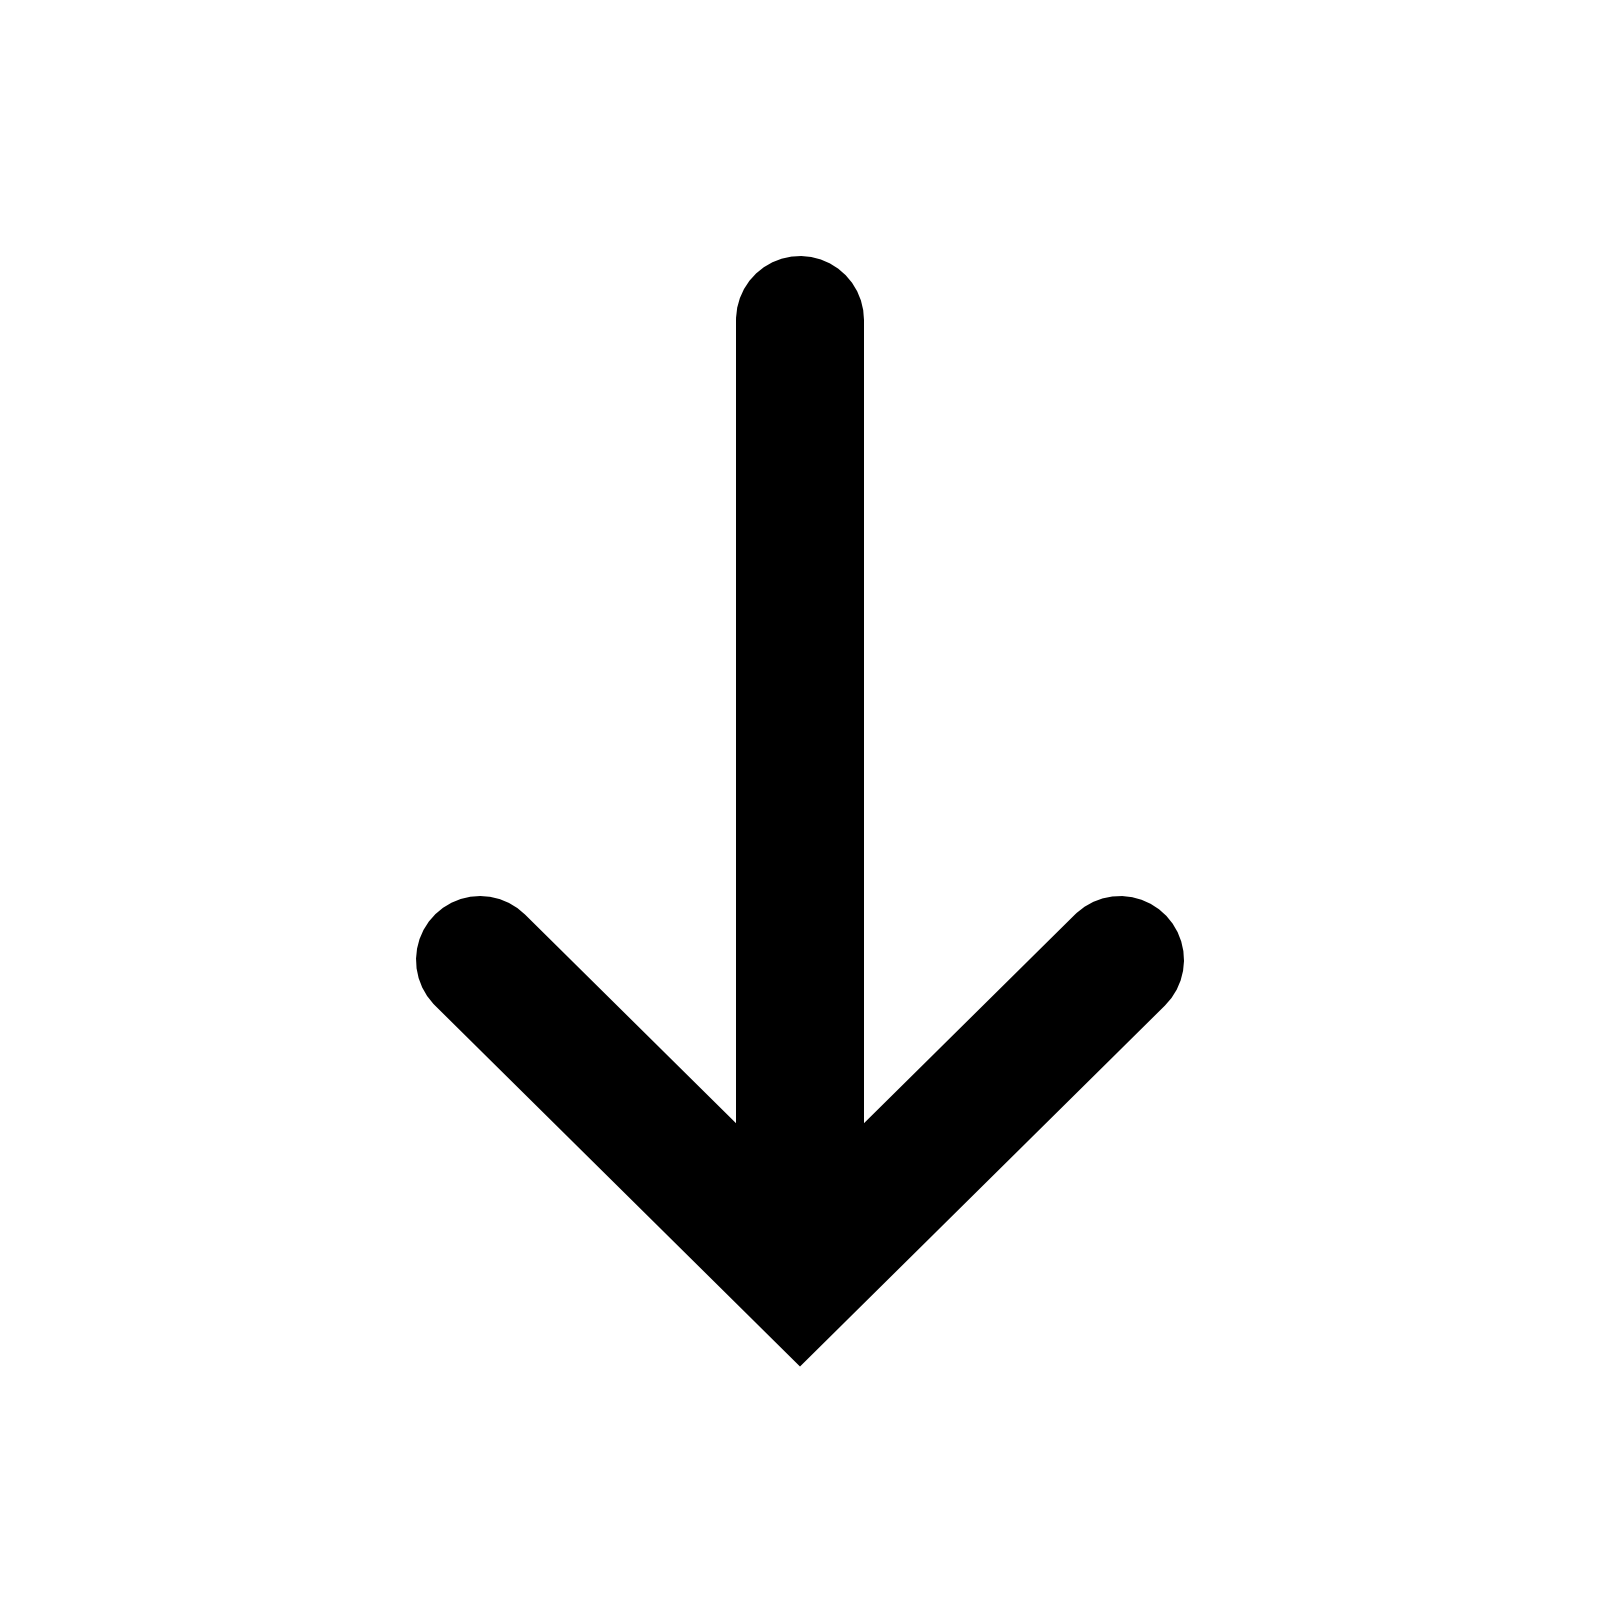 Down Arrow transparent PNG - StickPNG